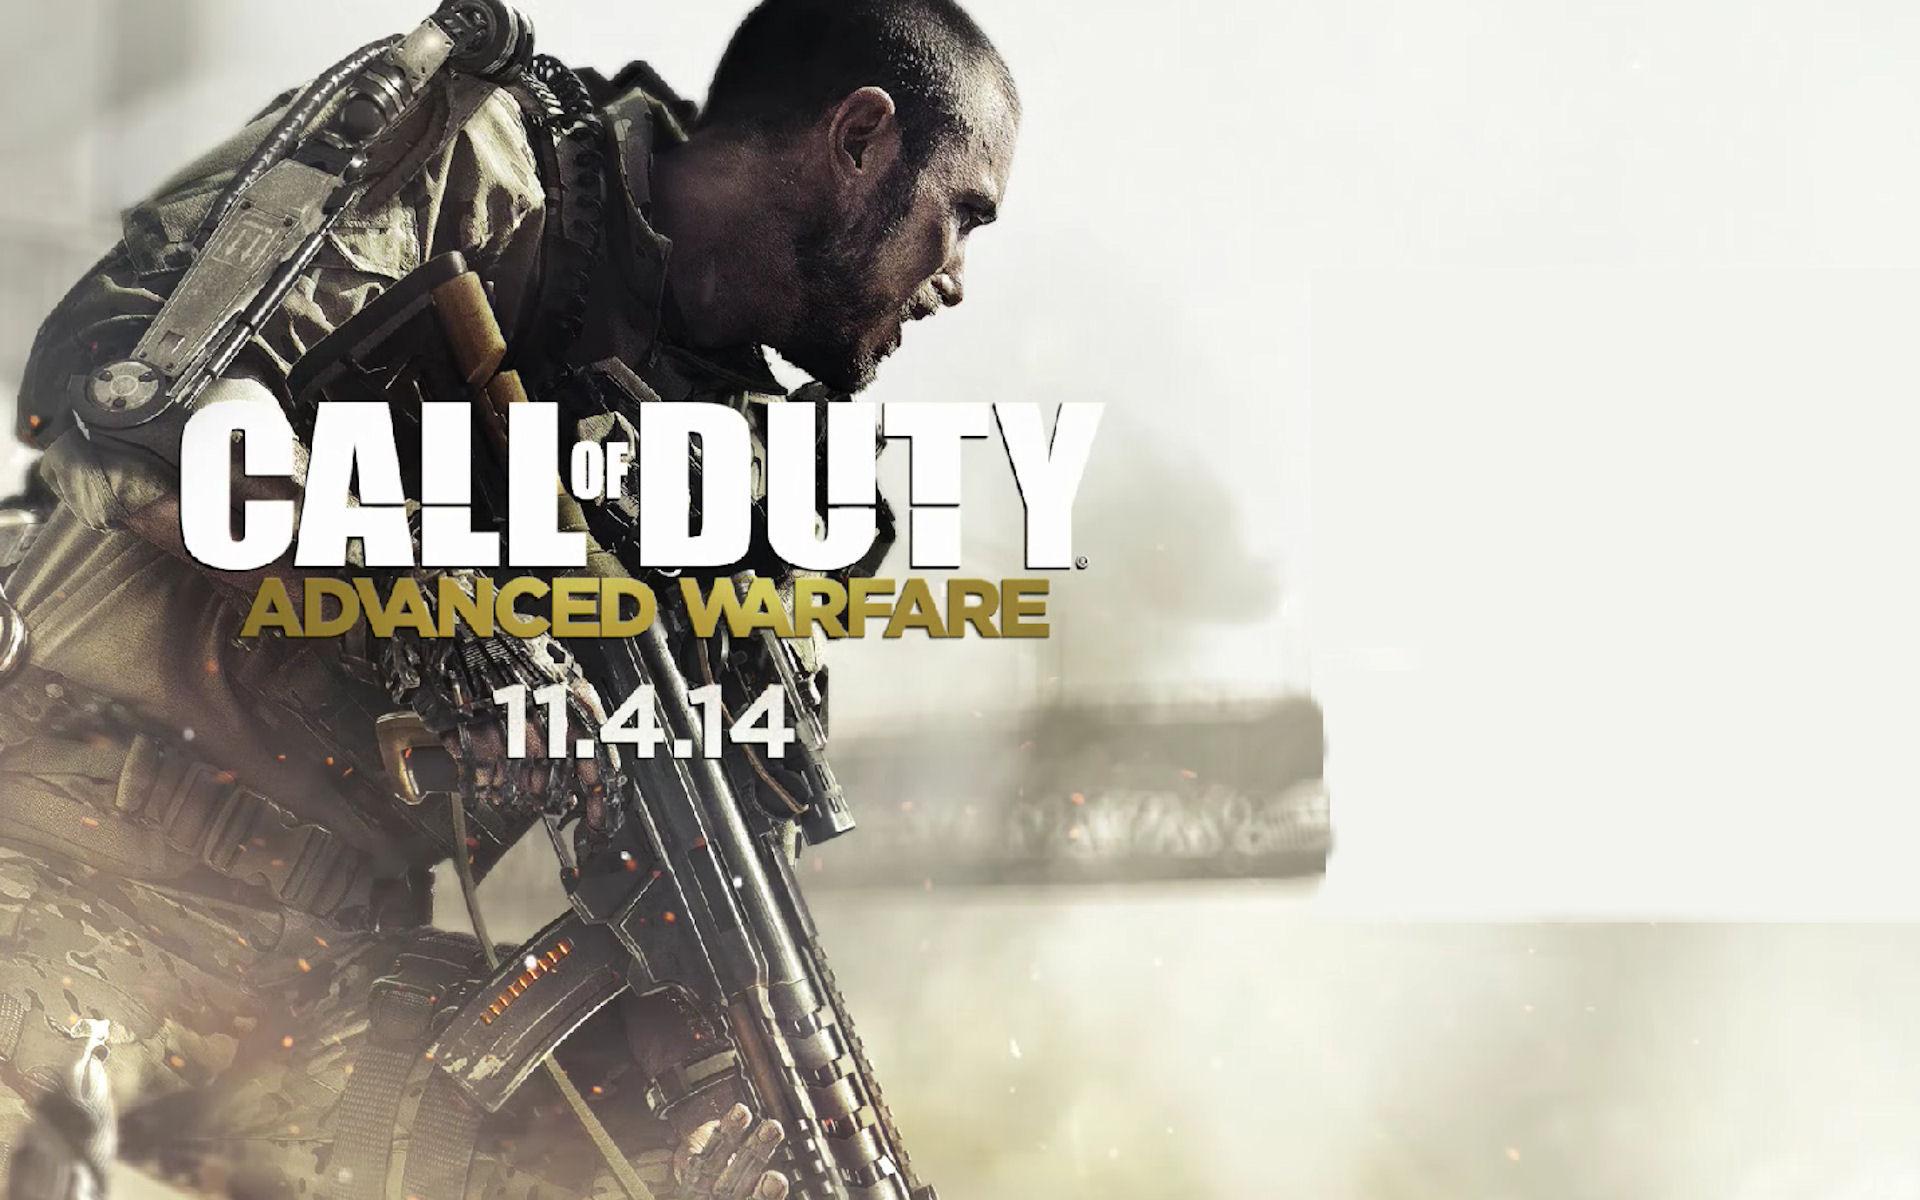 call-of-duty-advanced-warfare-soldier-wallpaper.jpg